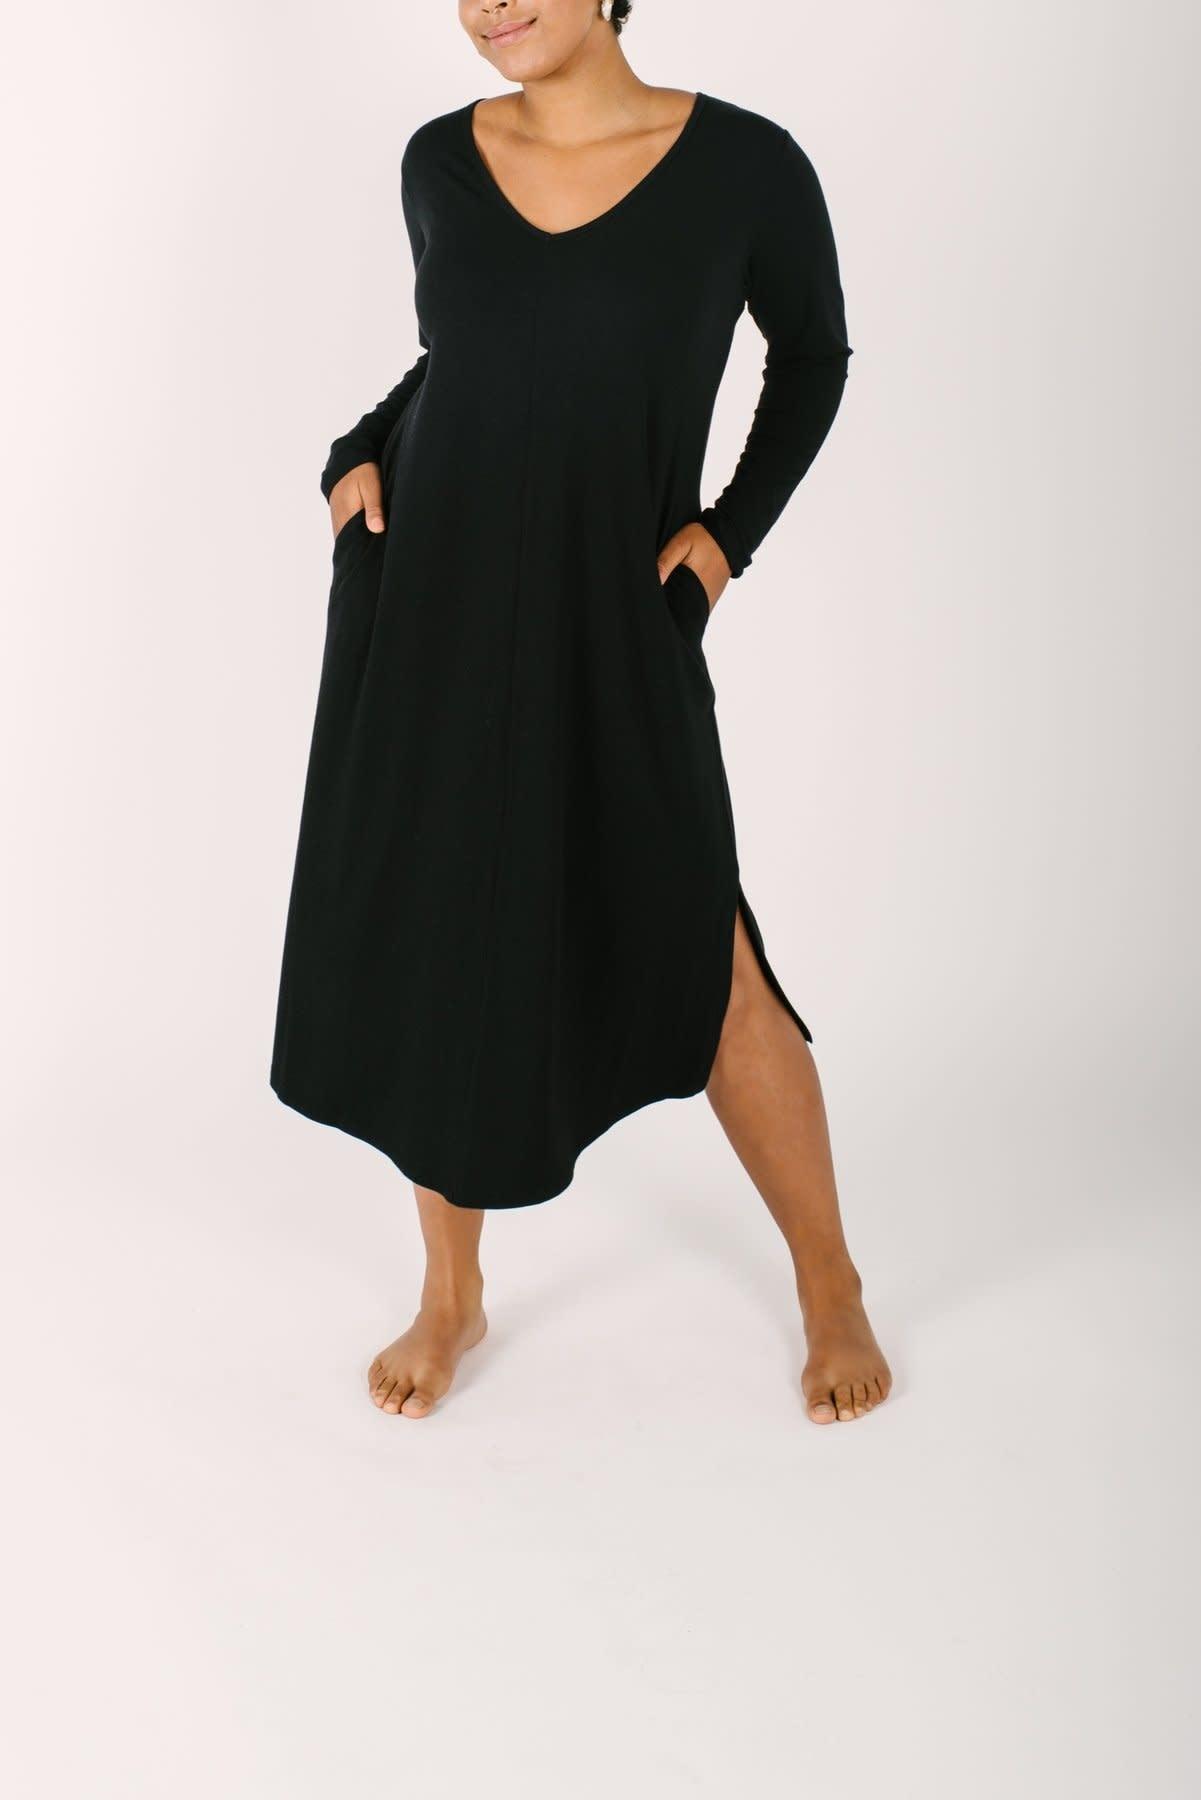 Smash + Tess Friday Dress